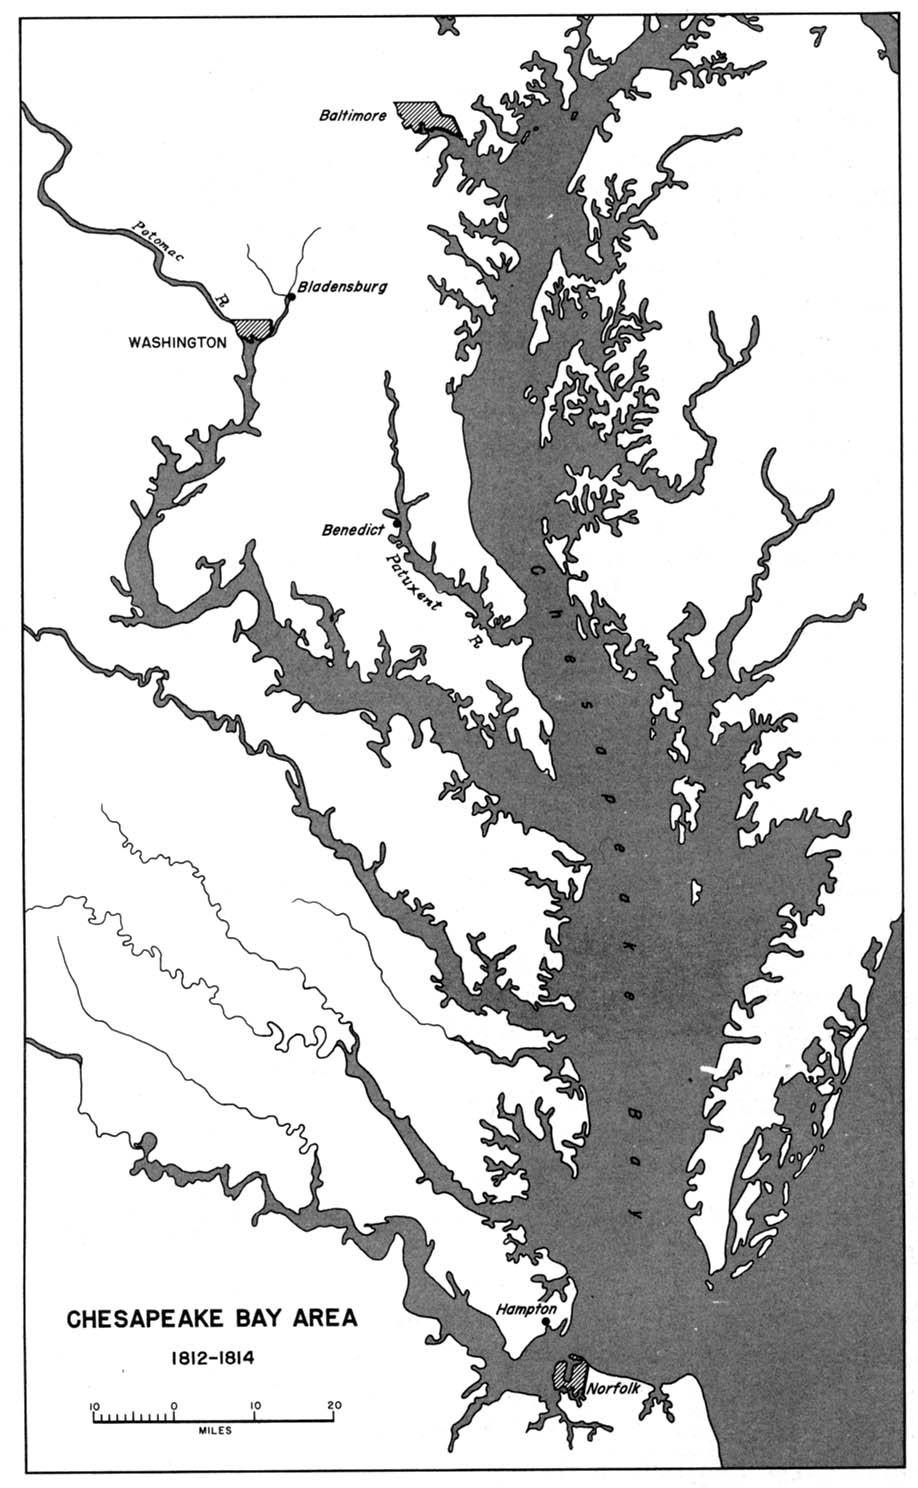 medium resolution of courtesy http www lib utexas edu maps historical chesapeake 1812 1814 jpg